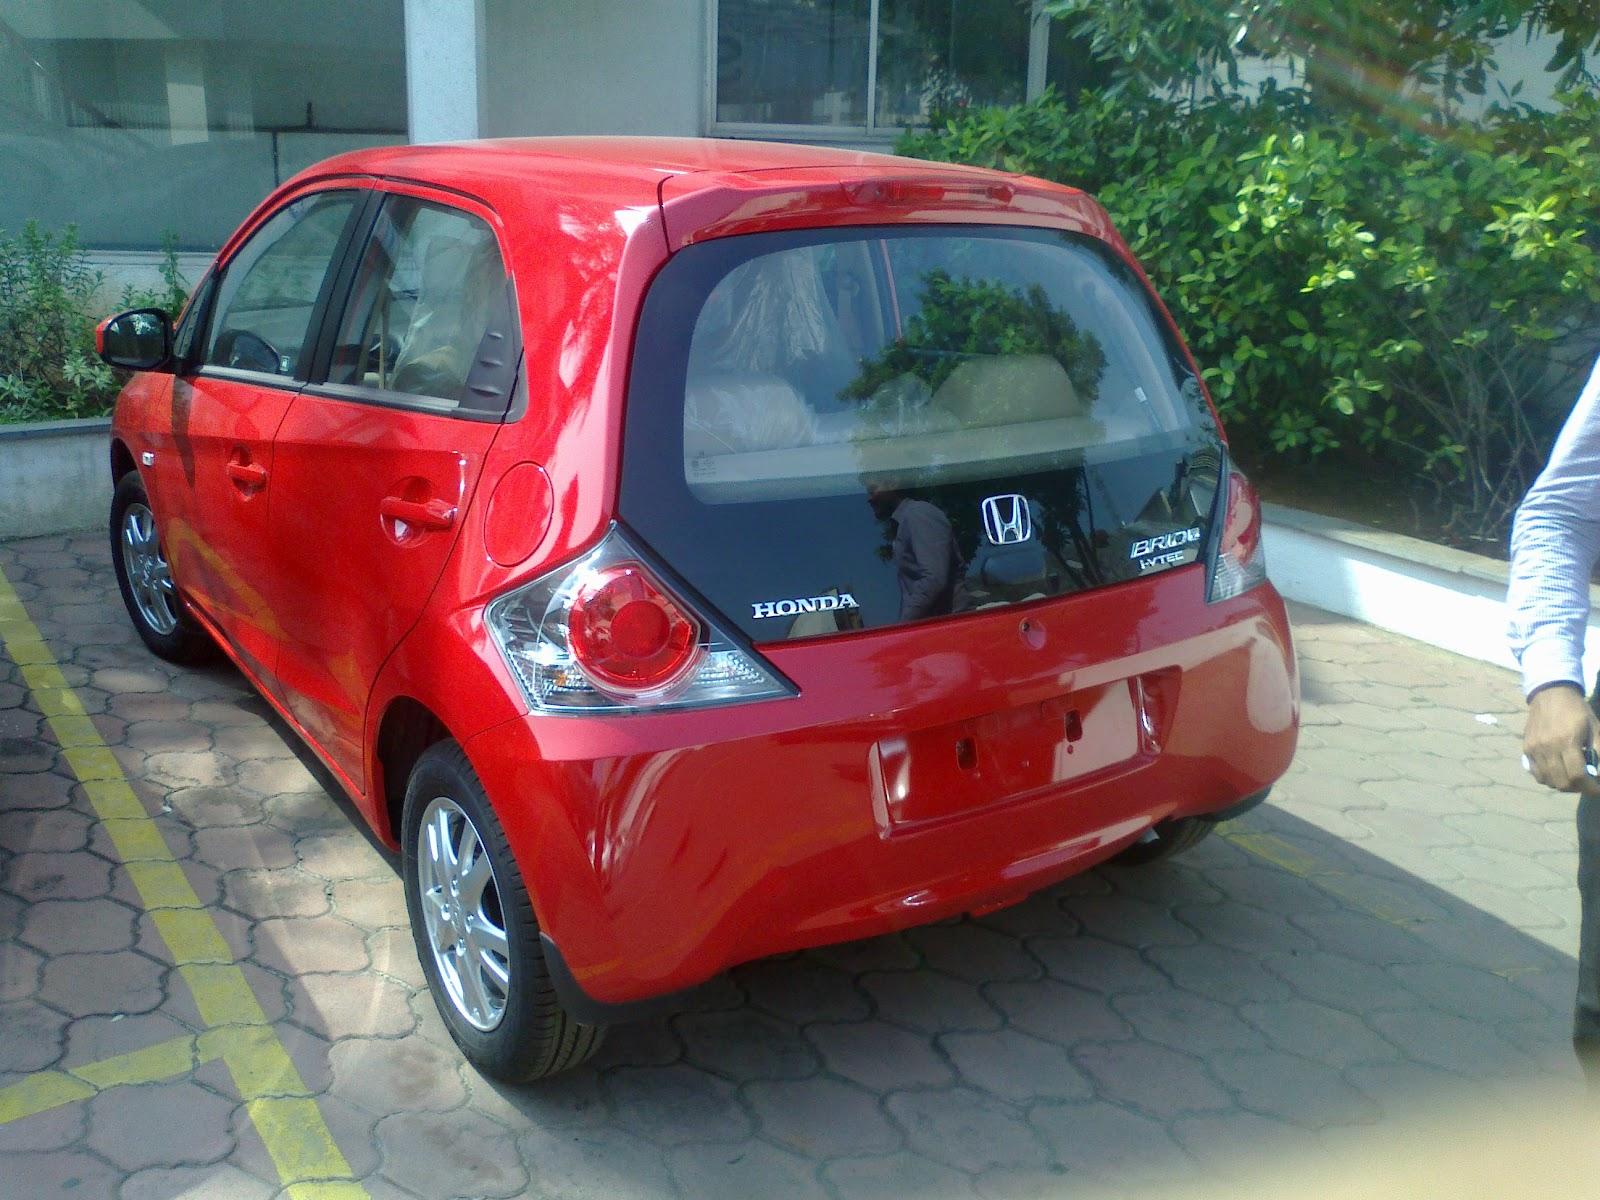 http://3.bp.blogspot.com/-O01YL7c9IcQ/UGBT_9EI5-I/AAAAAAAAiQI/yJazmk3Ckfs/s1600/New-Honda-Brio+-Automatic+-transmission+-+India-2.jpg